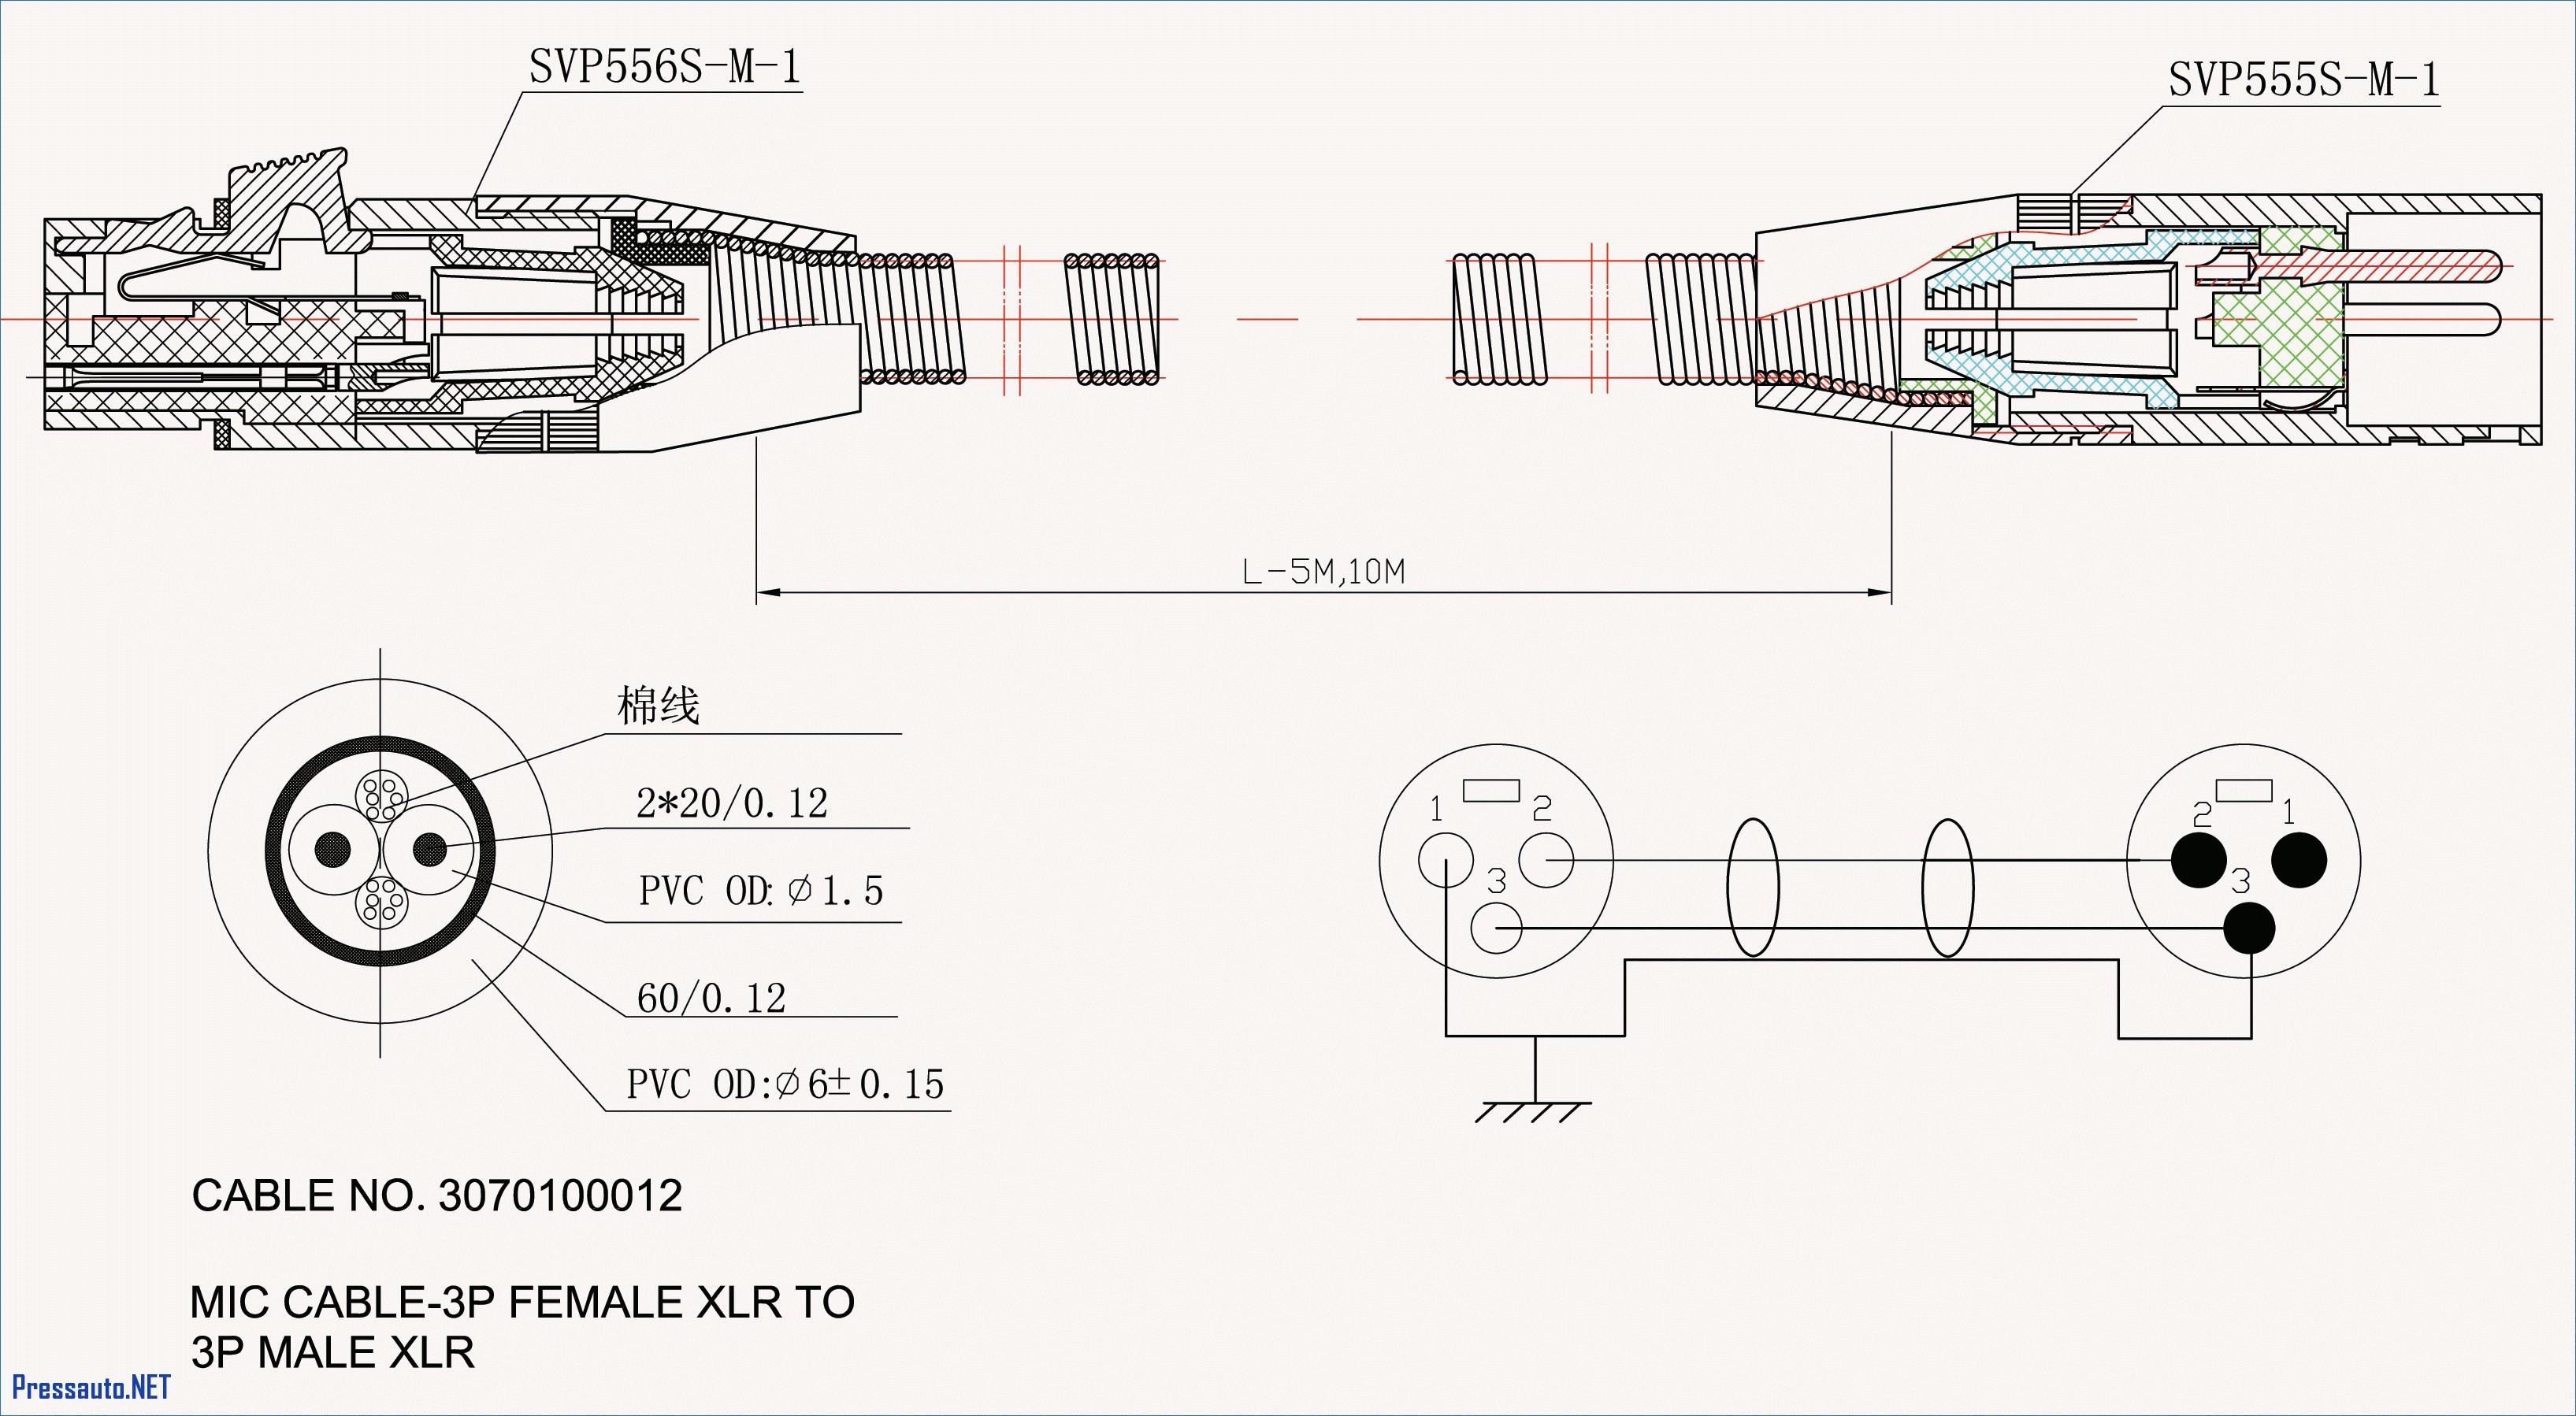 Fasco Motor Wiring Diagram Chevy 7 Pin Trailer Wiring Diagram Pickenscountymedicalcenter Of Fasco Motor Wiring Diagram